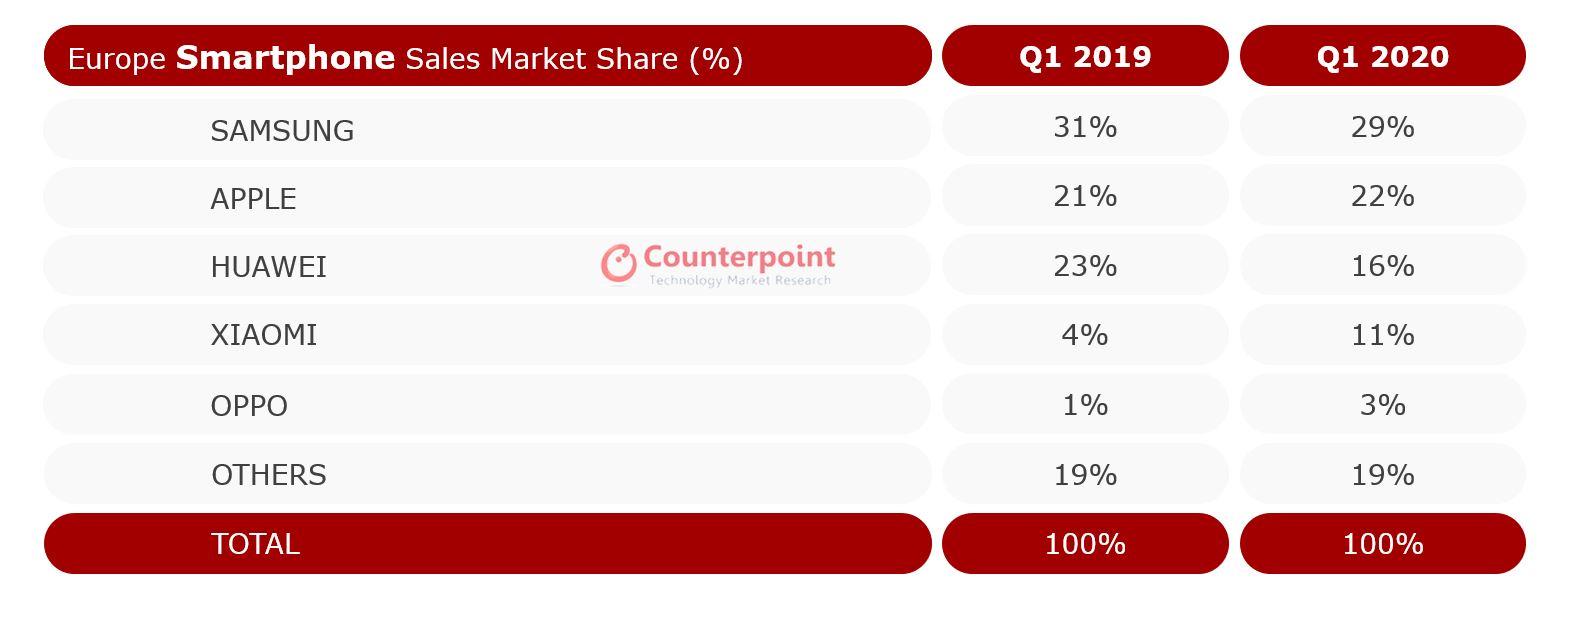 Europe Smartphone Sales Market Share (%), Q1 2019 vs Q1 2020